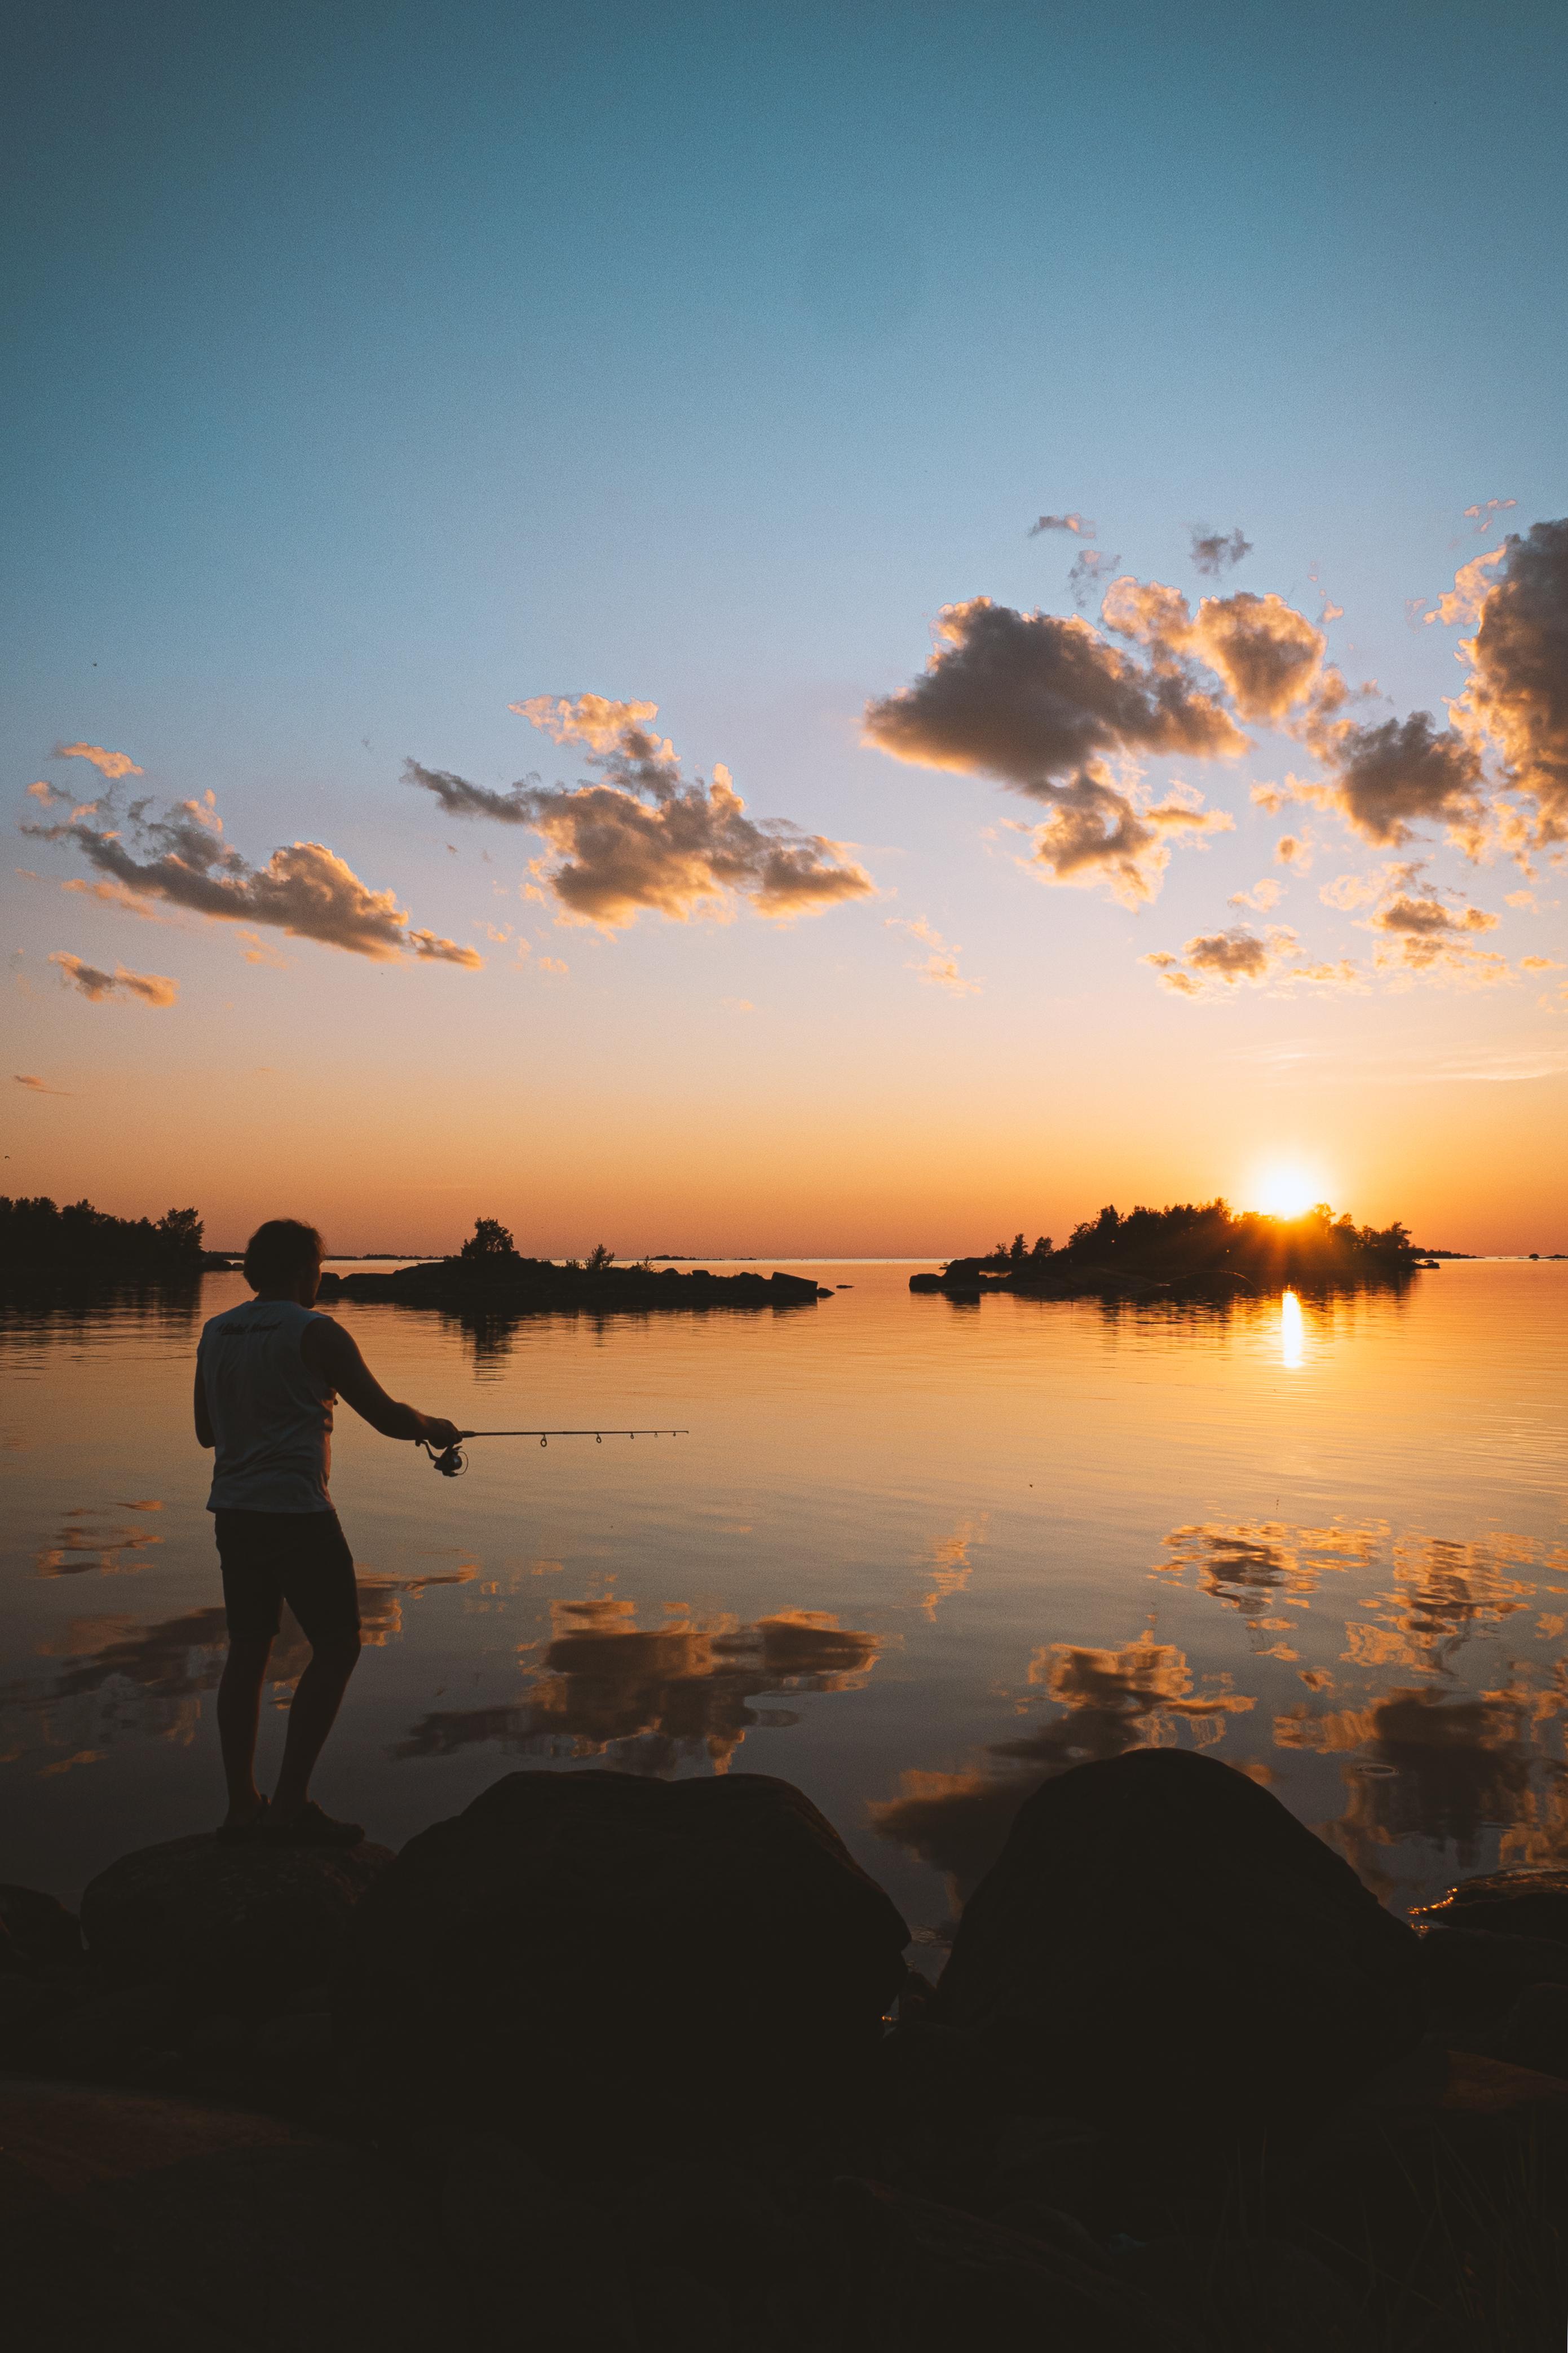 Kalastusta kesäyössä. Tuukka Lindholm.